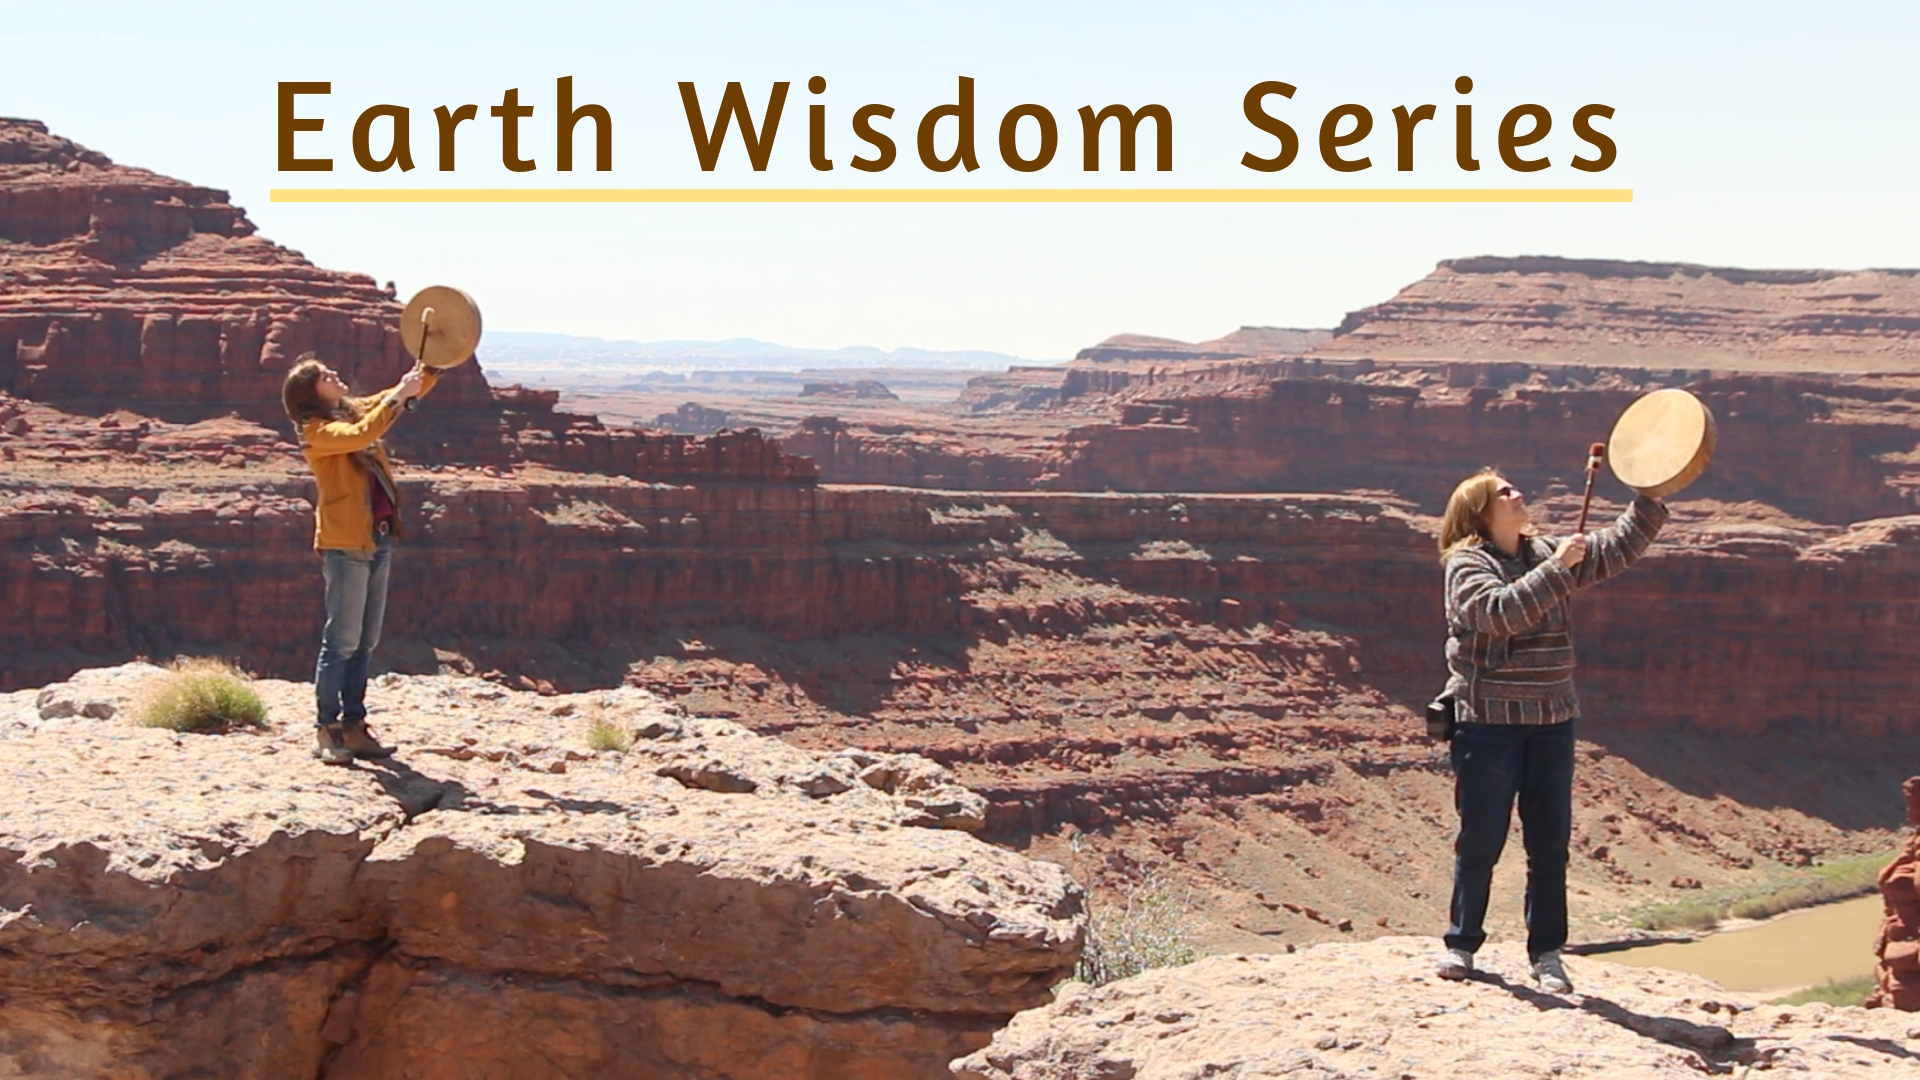 Earth Wisdom Graphic.jpg